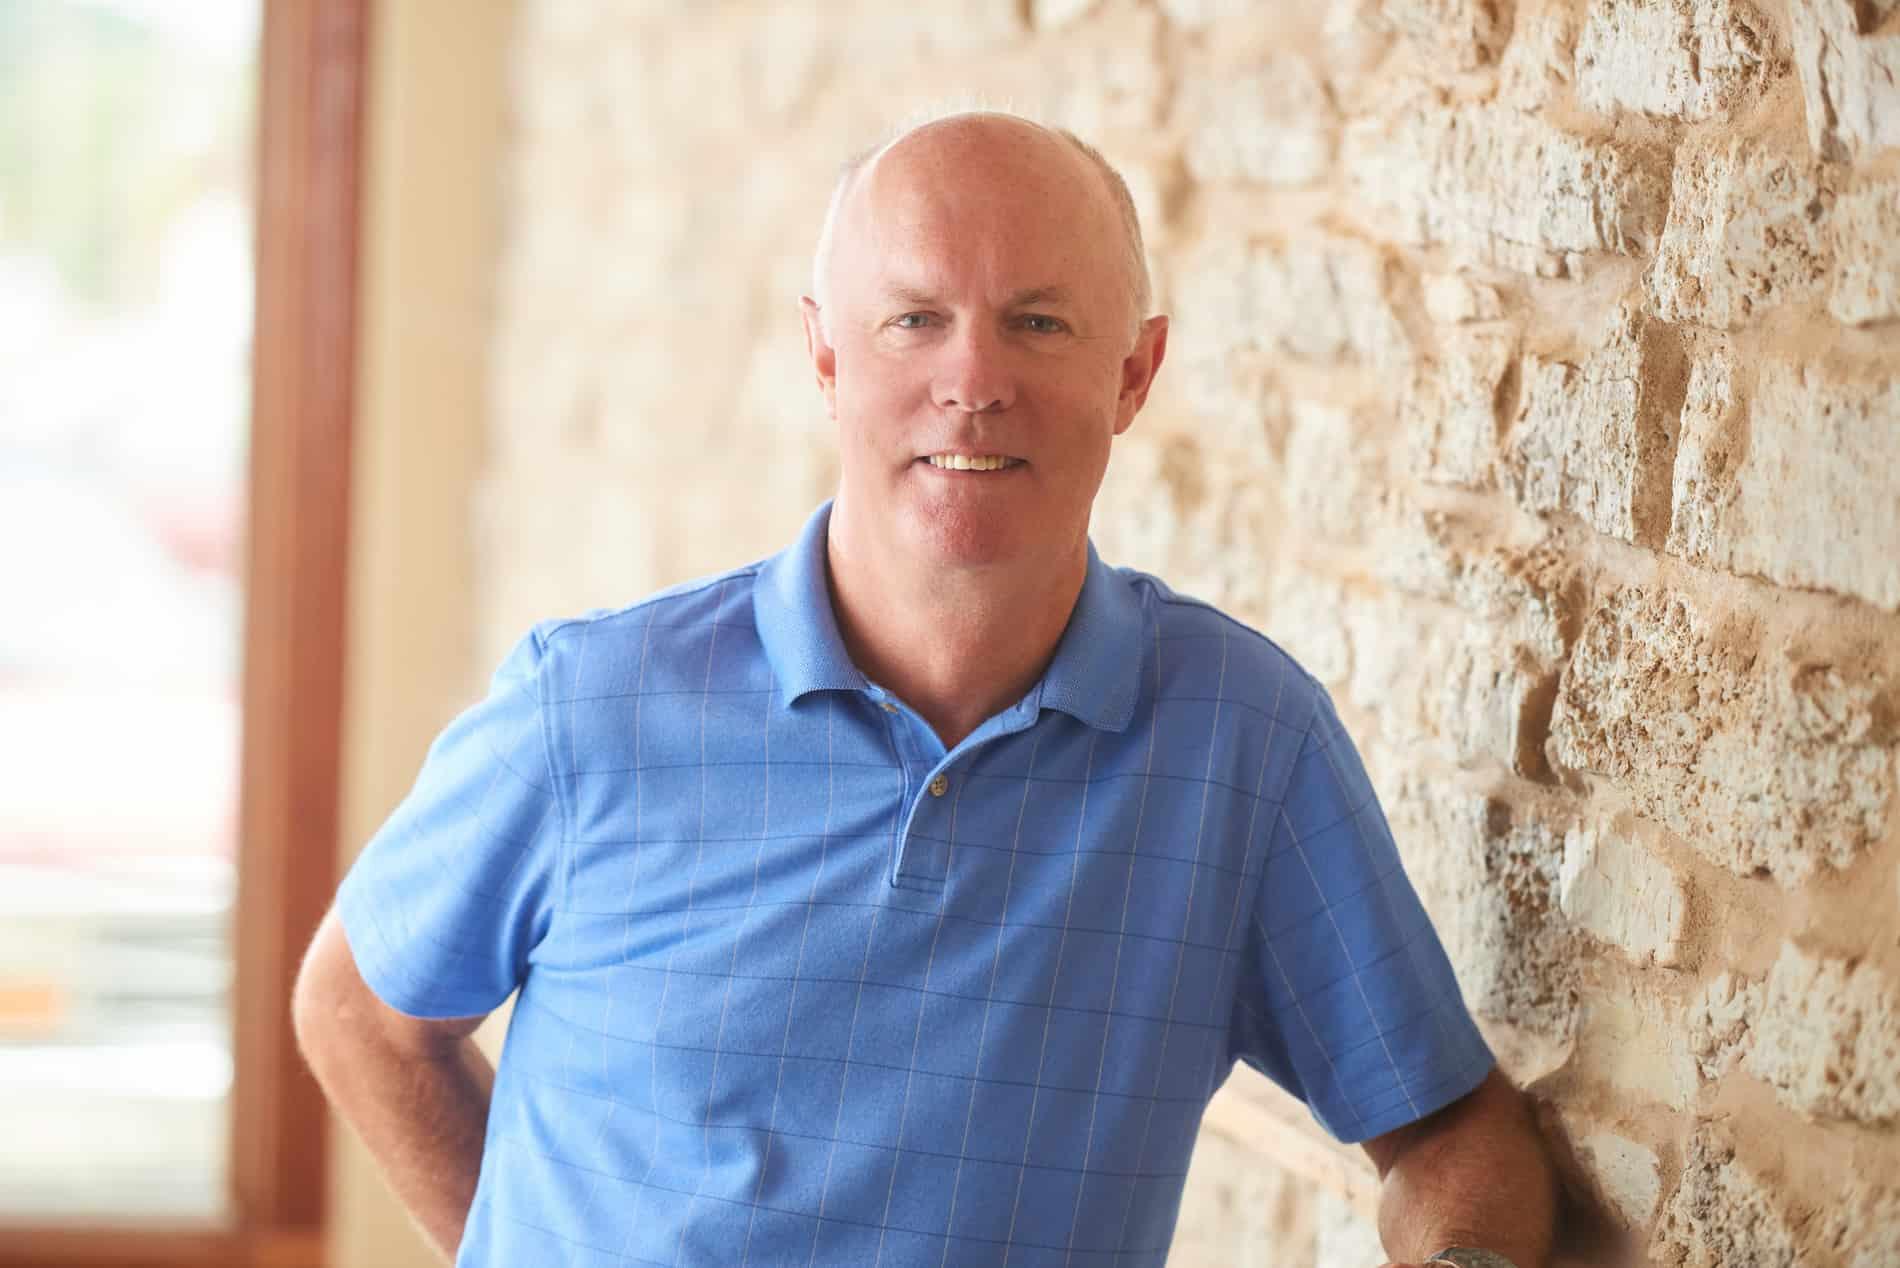 Jake Imhoff - 2019 New Albin Savings Bank Headshot